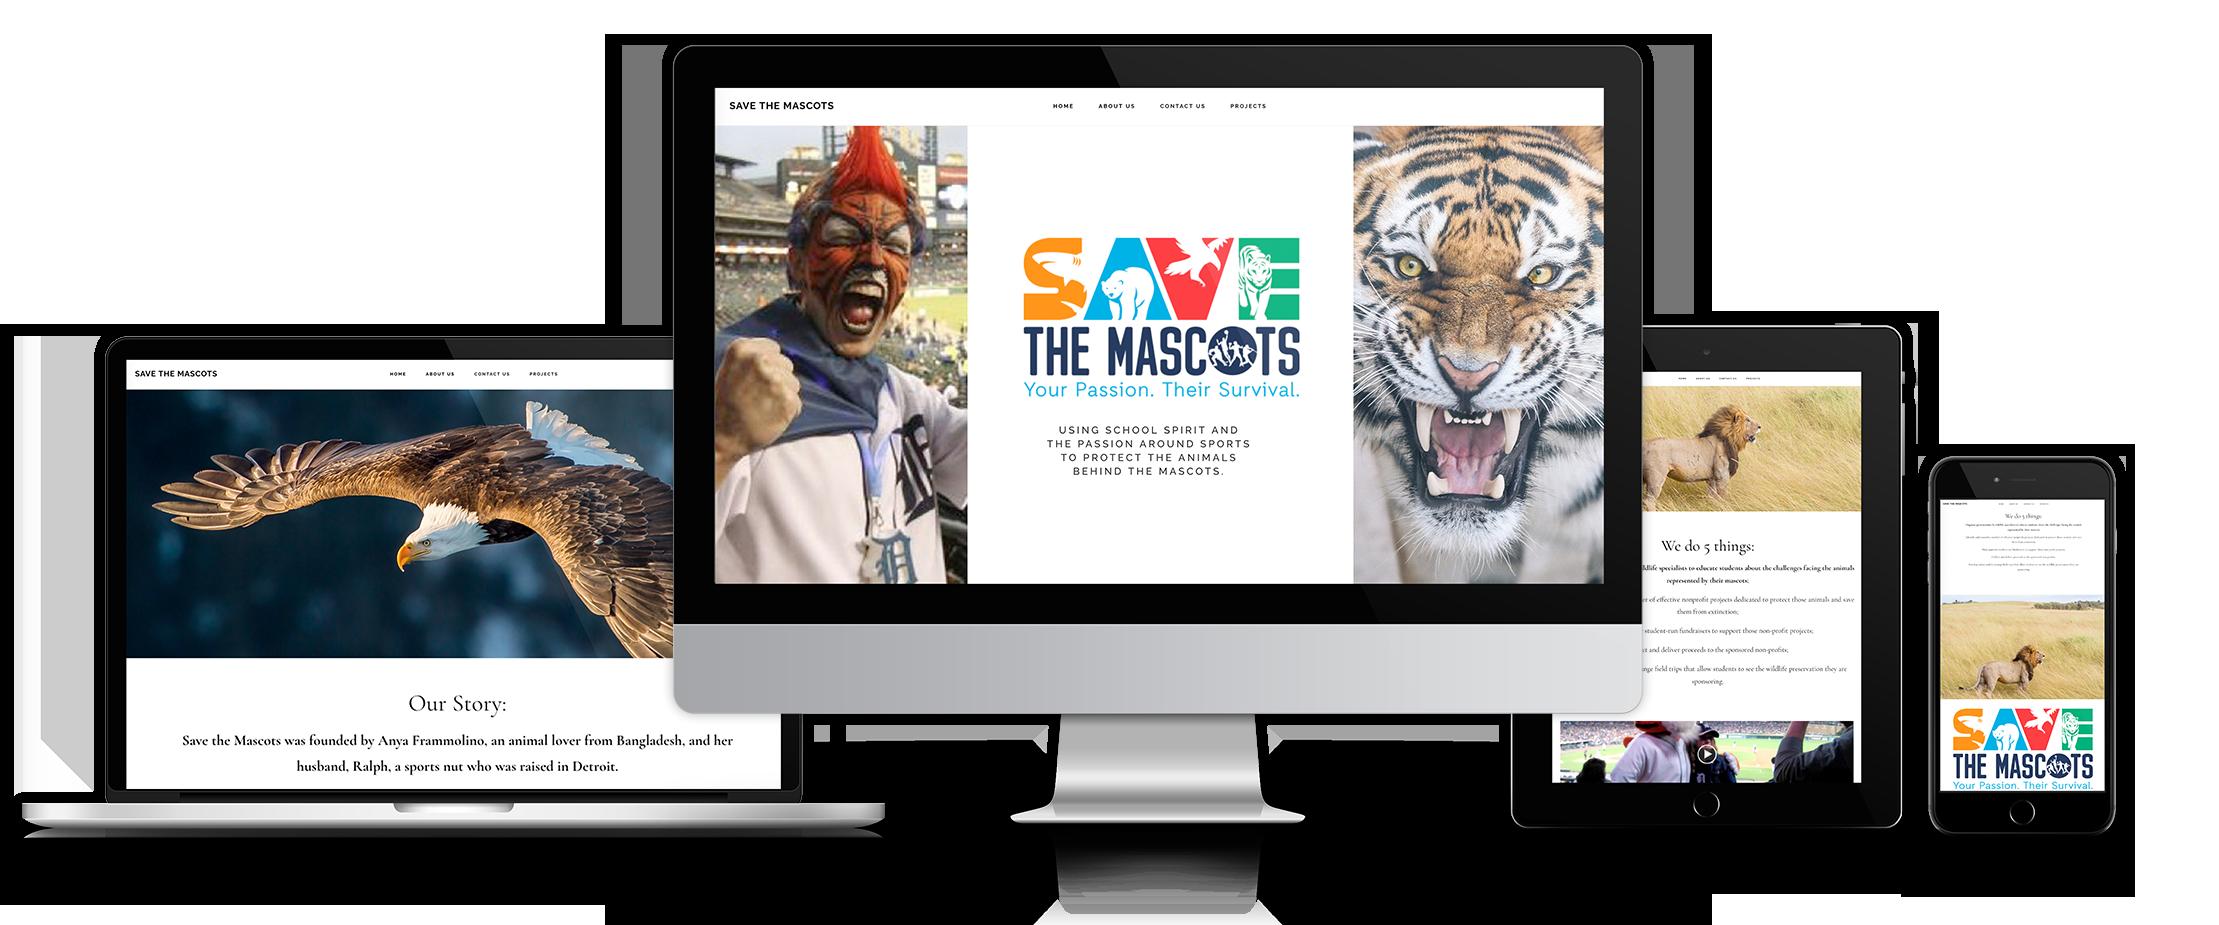 mascots-site mockup.png